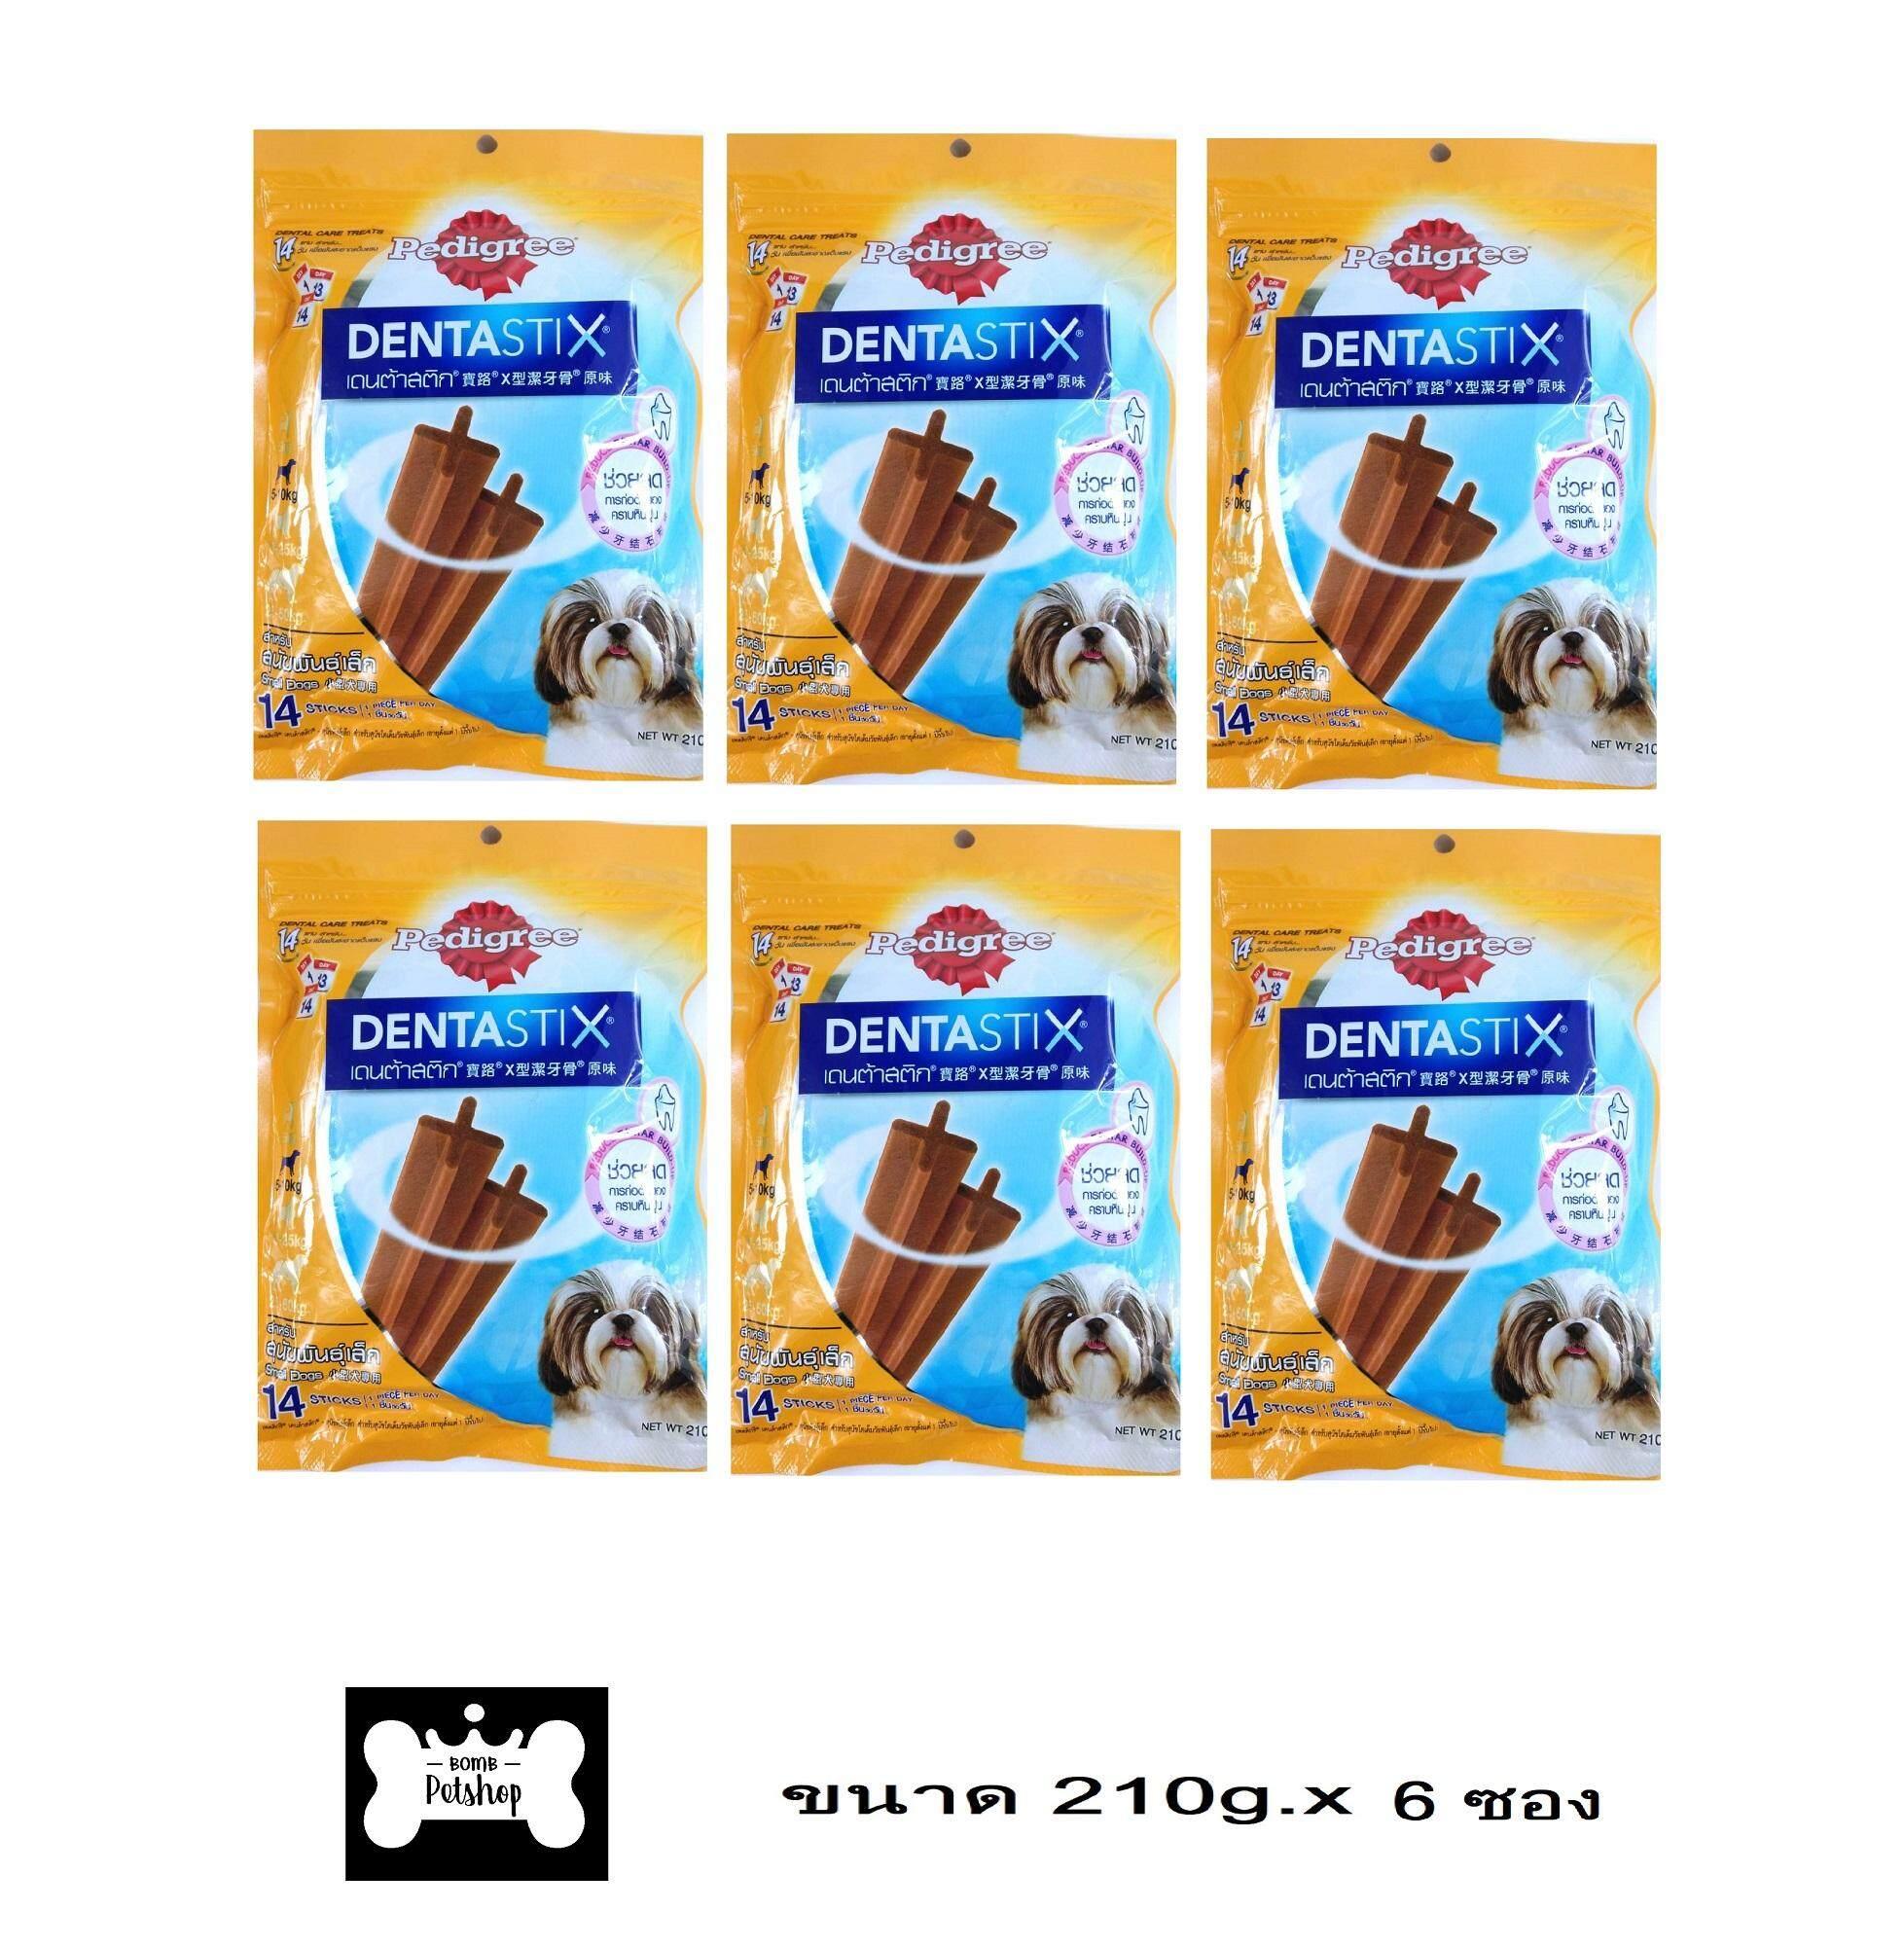 Pedigree Dog Snack Denta Stix Value Pack Small ( 6 Units ) เพดดิกรี ขนมสุนัข เดนต้าสติก สุนัขพันธุ์เล็ก 210กรัม 6 ถุง By Bomb Petshop.